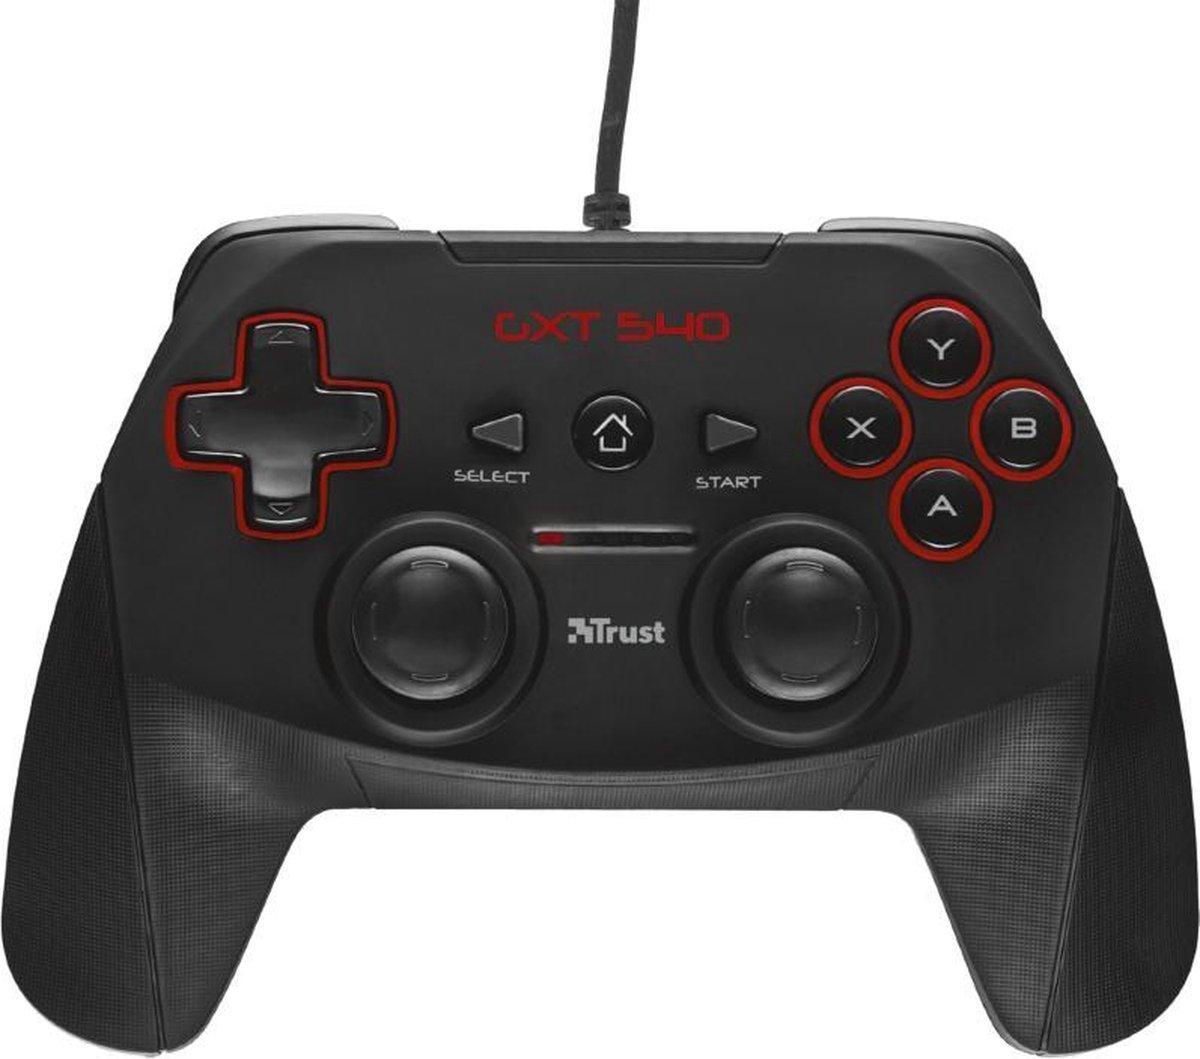 GXT 540 Yula Gamepad - Controller voor PC & PlayStation 3 - PS3 - Zwart